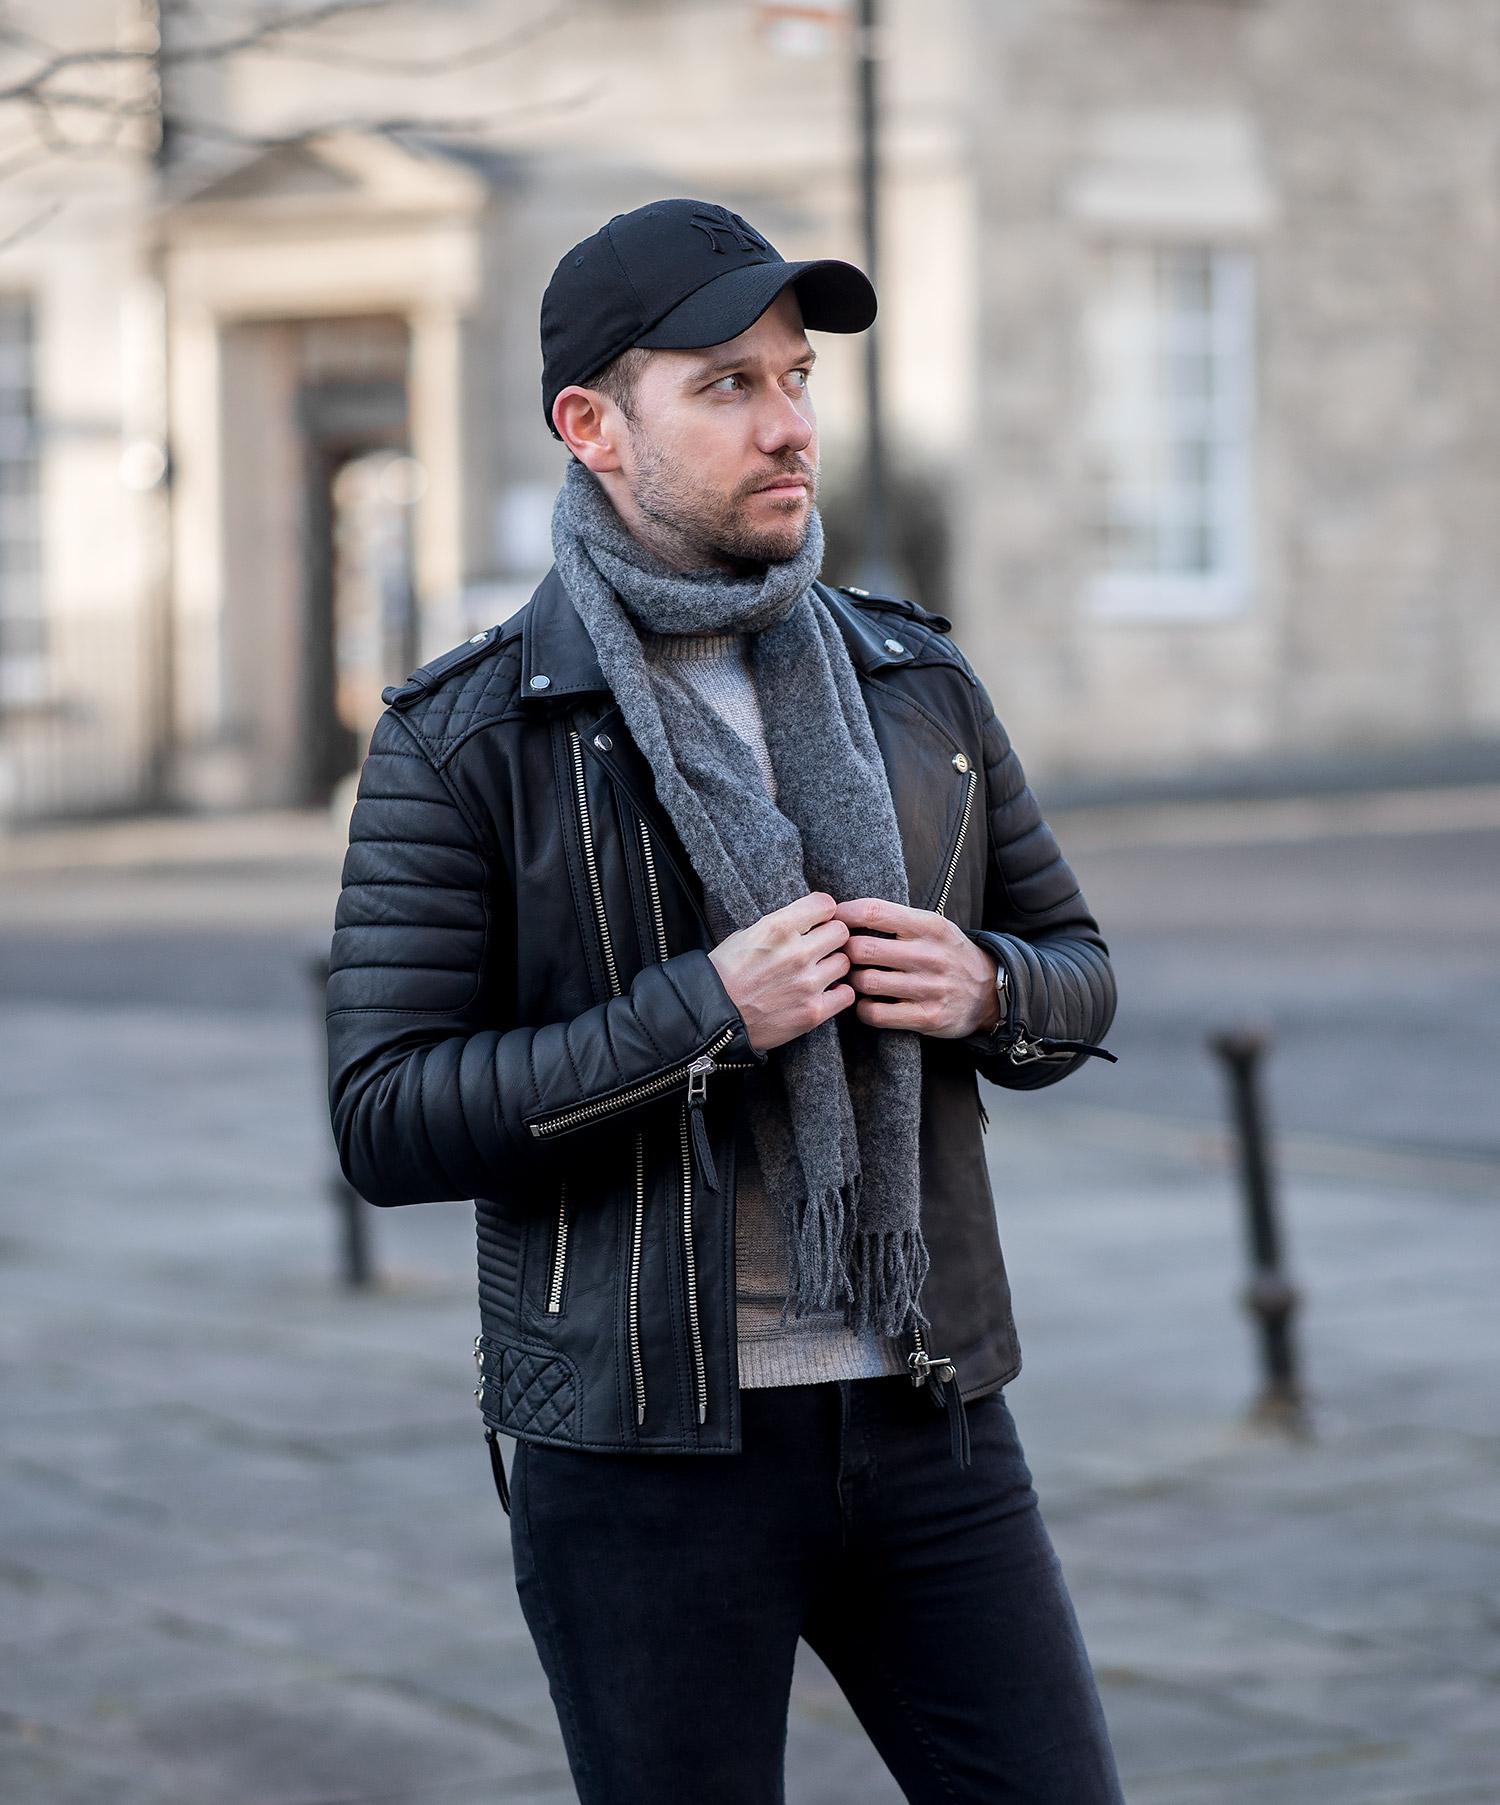 35ed8c935a7 ... leather jacket men s fashion Source · Boda Skins Biker Jacket Winter  Style Your Average Guy